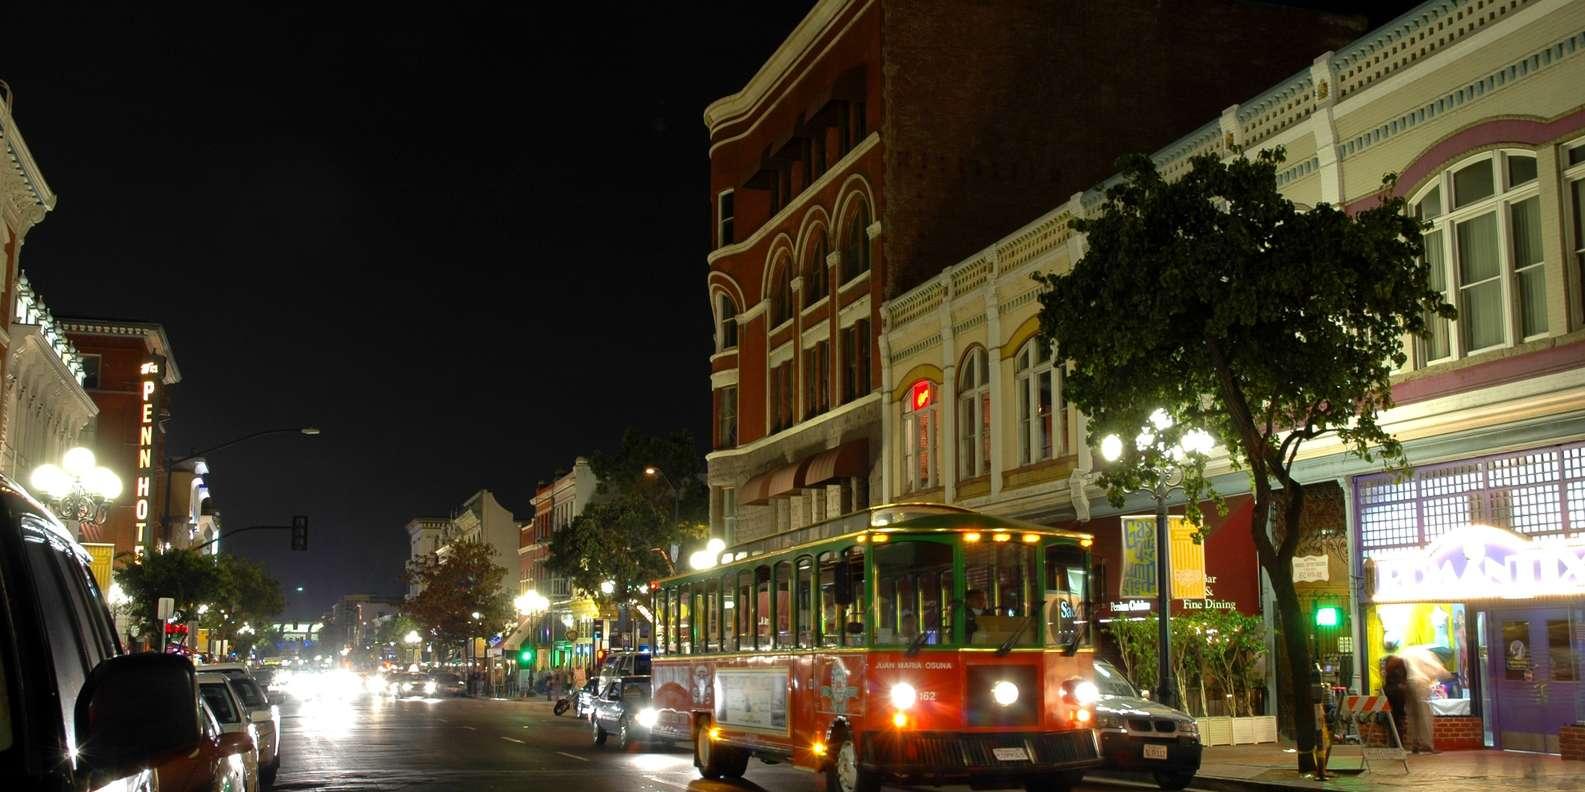 Enjoy the Nighttime City Lights